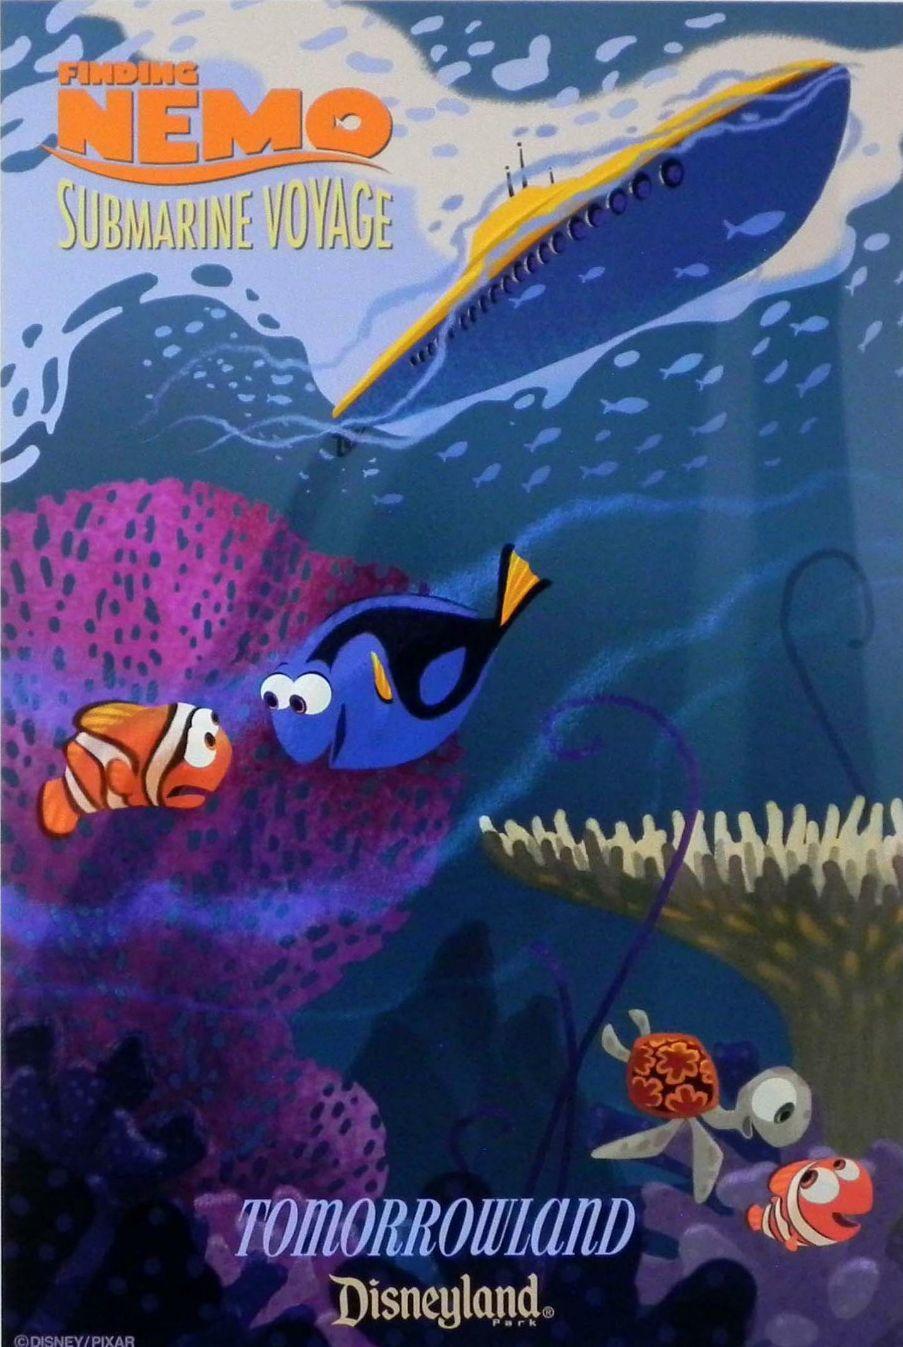 finding nemo submarine voyage poster disney rides attractions disneyland tomorrowland. Black Bedroom Furniture Sets. Home Design Ideas